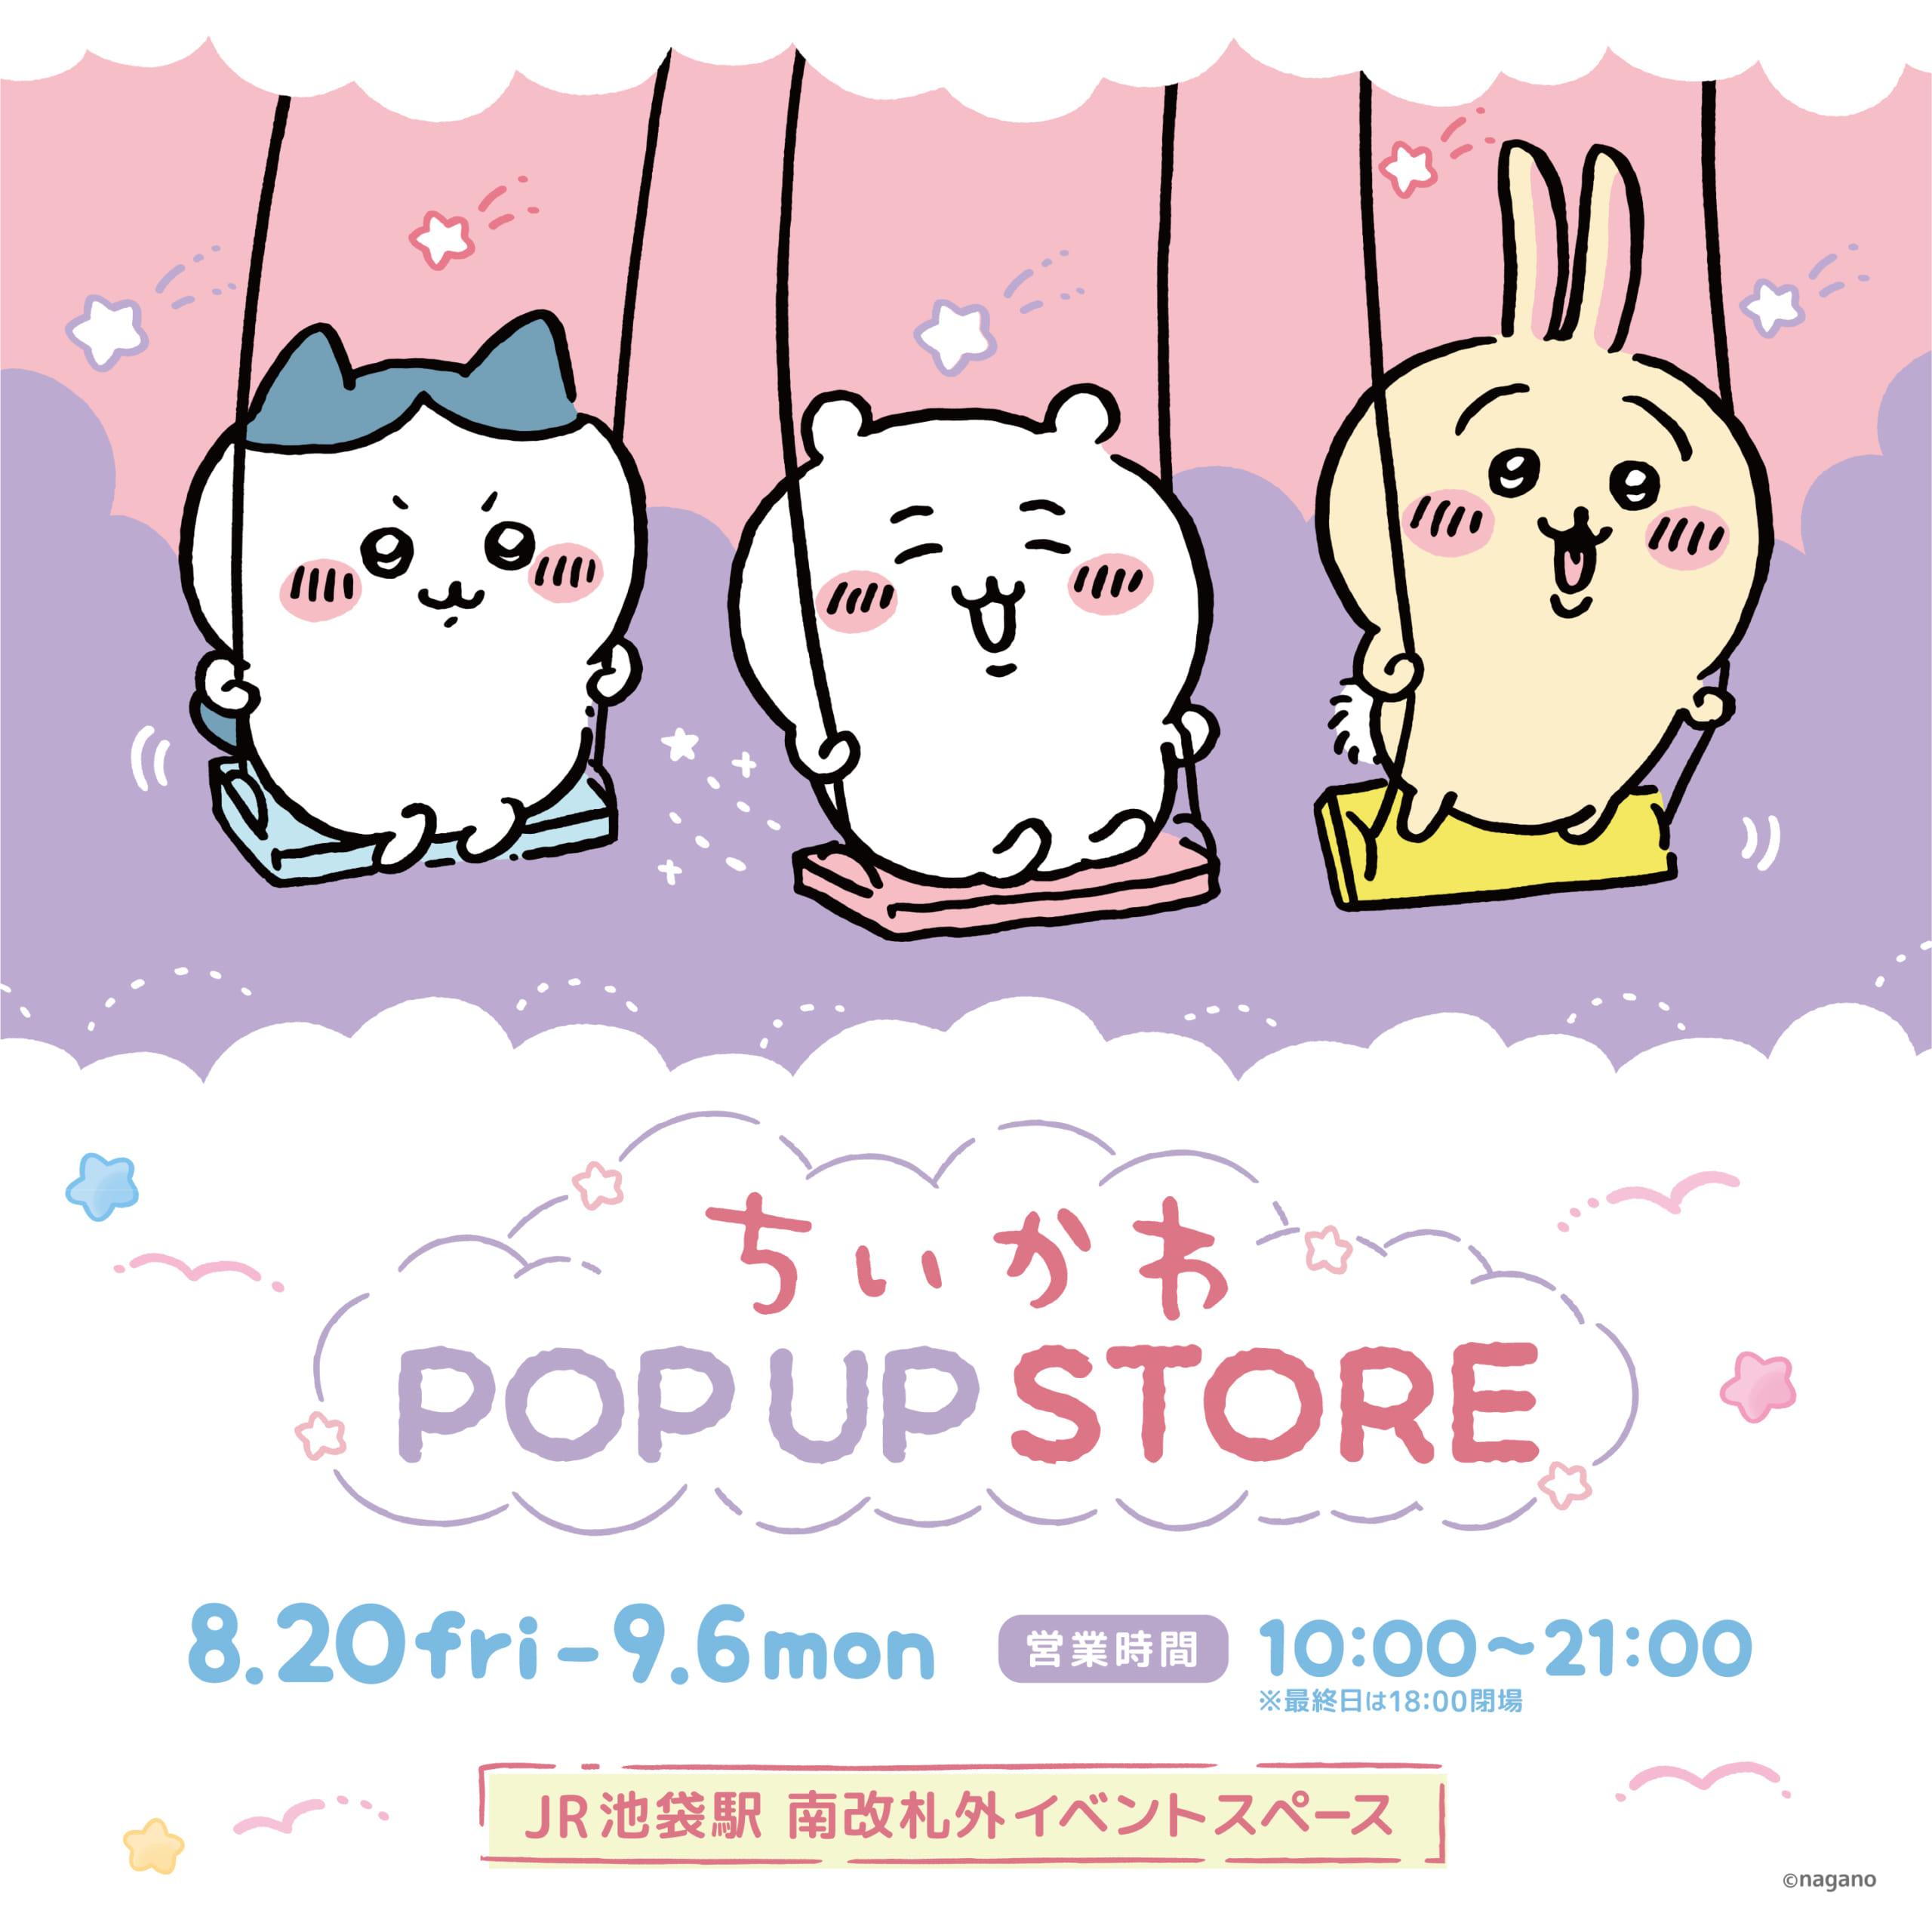 JR池袋駅 南改札外に「ちいかわ POP UP STORE」8月20日〜期間限定オープン